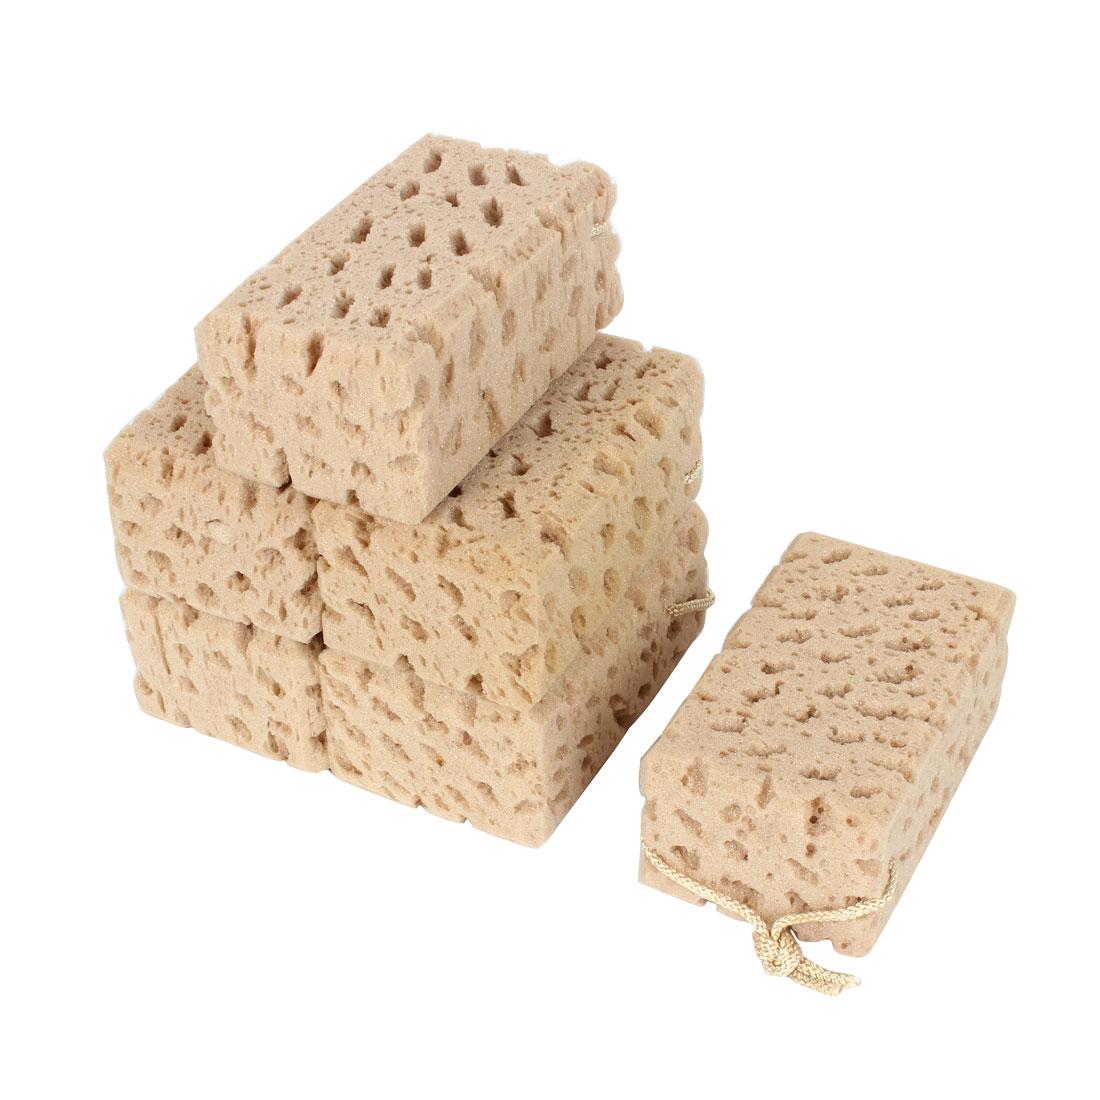 6Pcs Durable Practical Perforated Nonslip Car Wash Sponge Brown